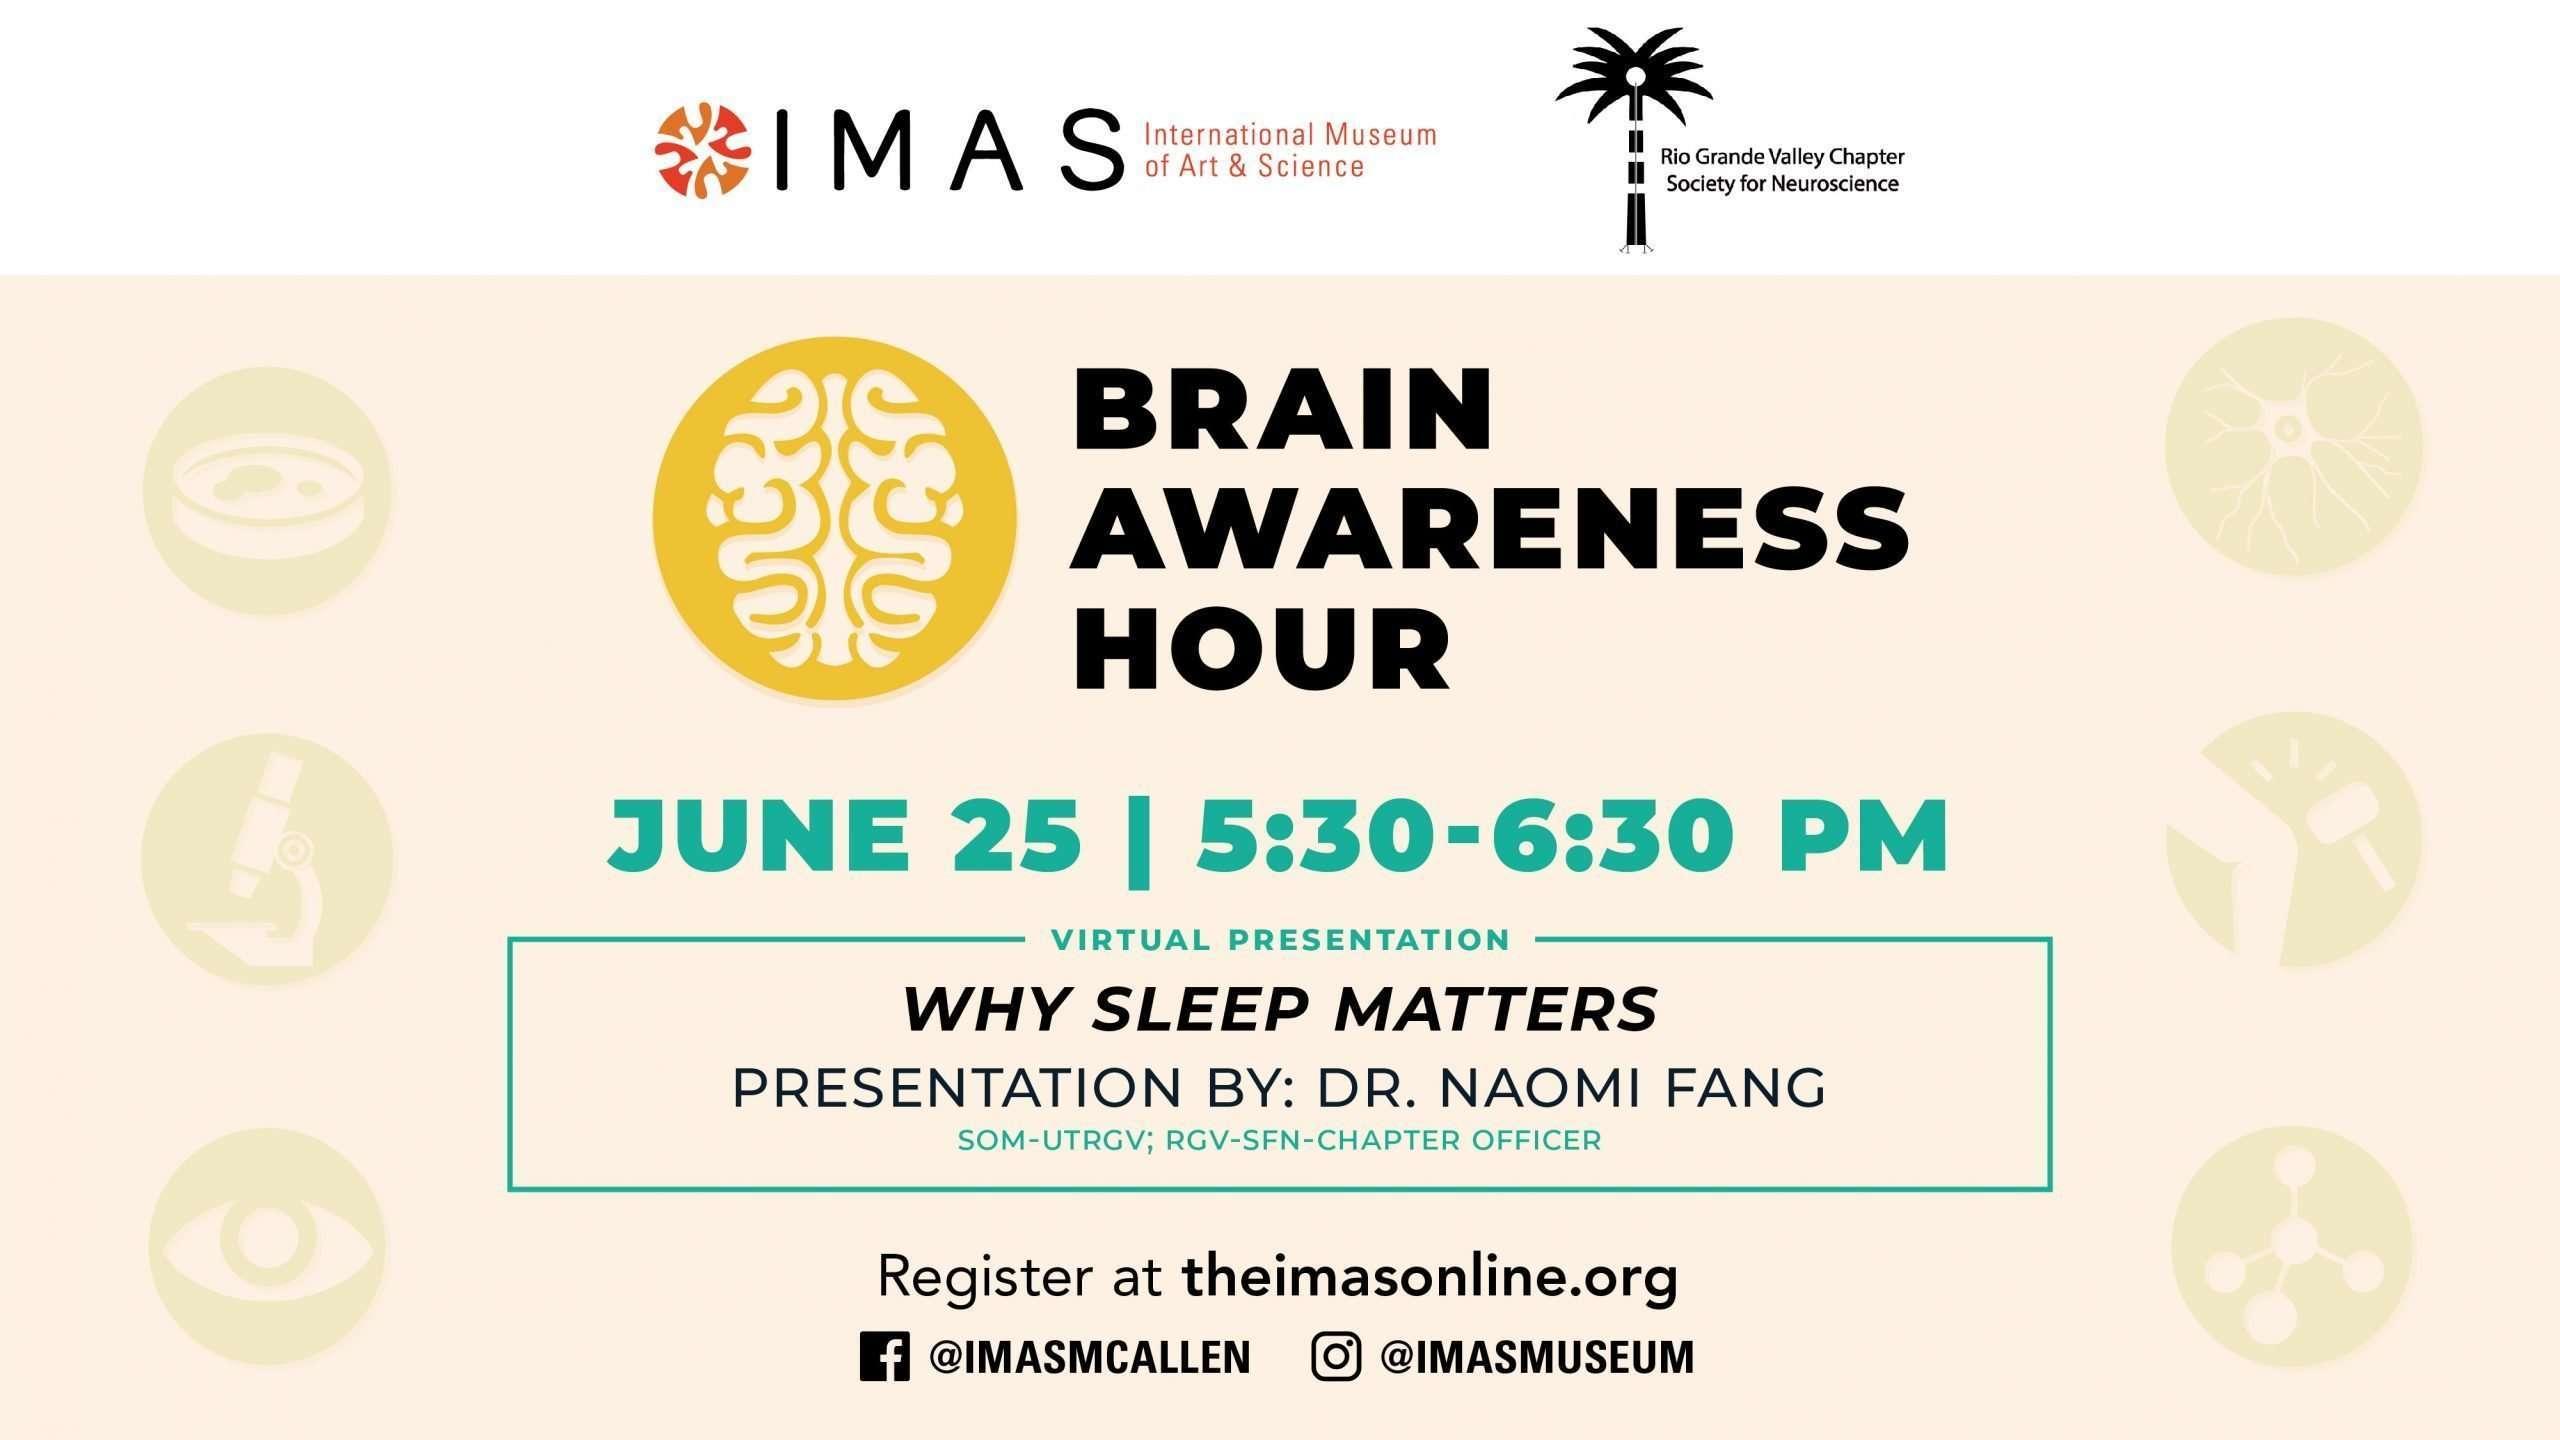 BrainAwarenessHour socials FB Event 1 scaled